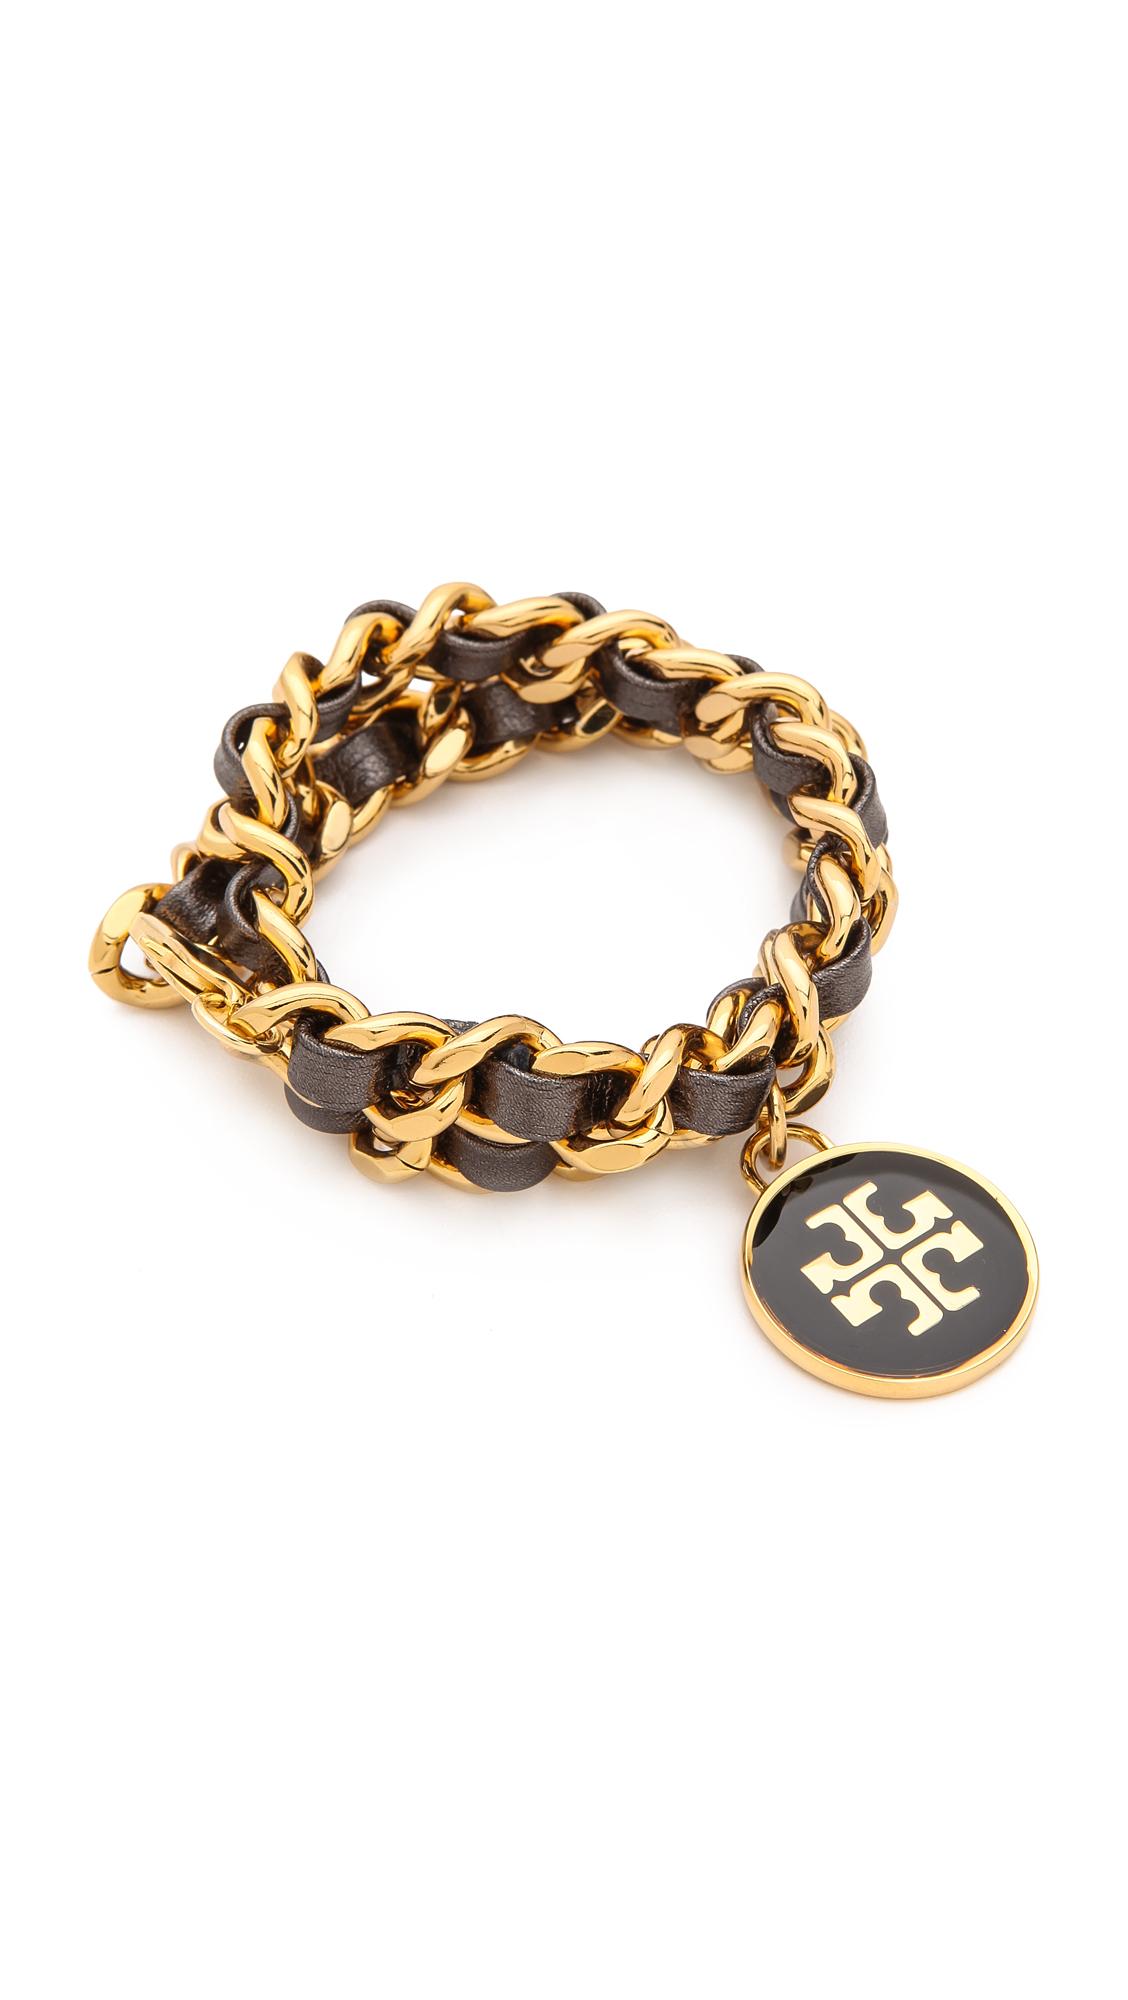 Tory Burch Metallic Leather Chain Double Wrap Bracelet In